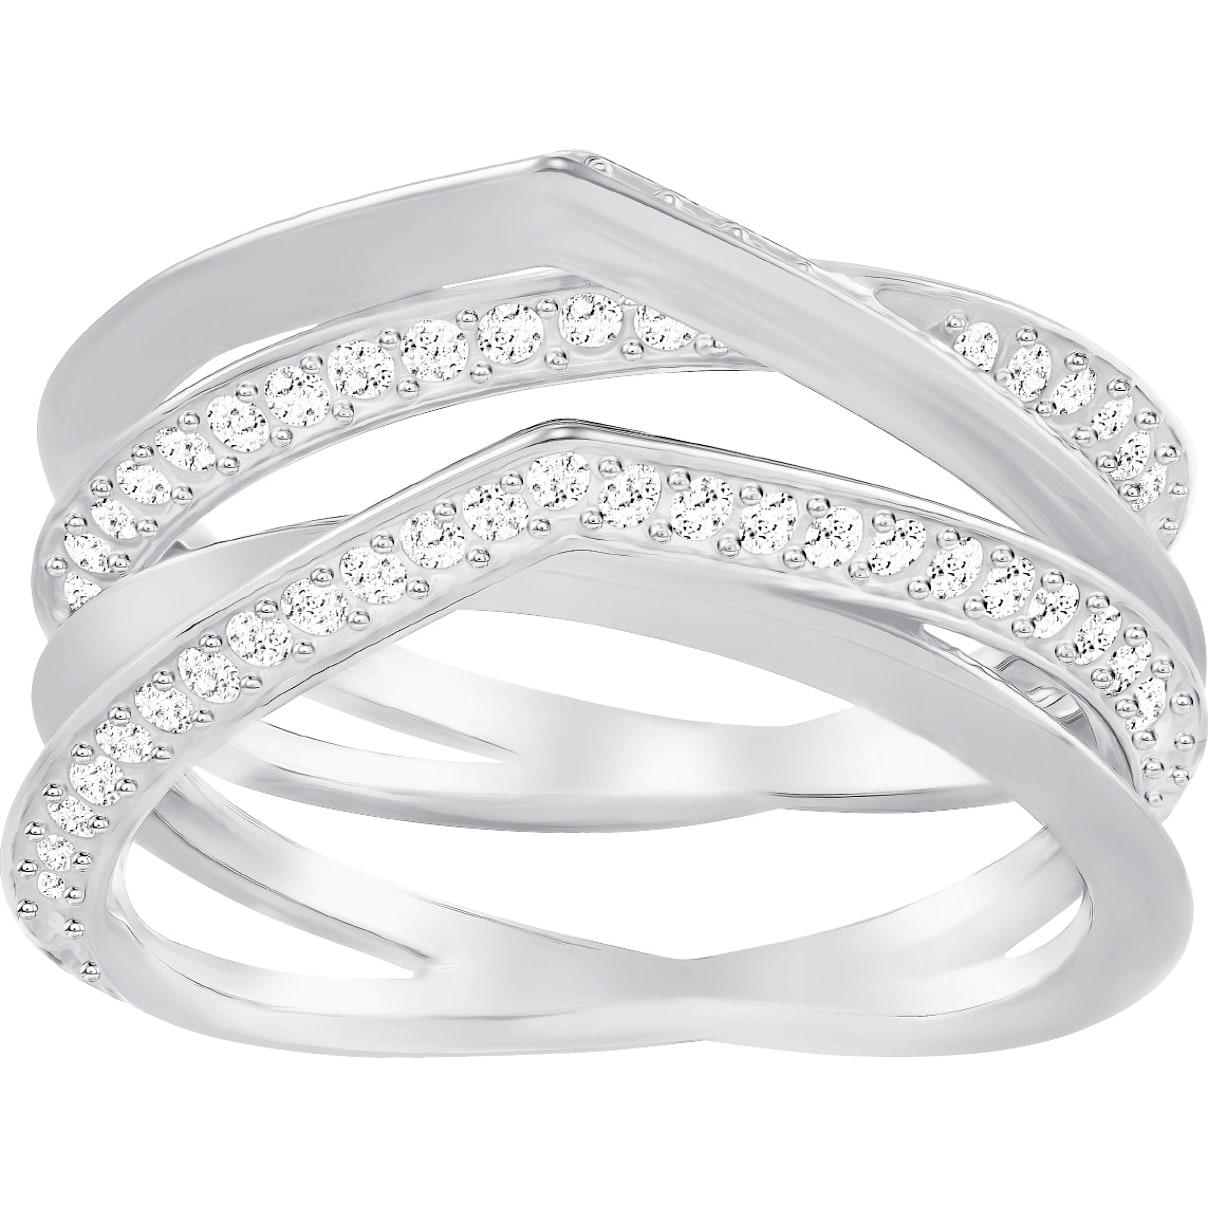 Swarovski Genius Ring, White, Rhodium Plating